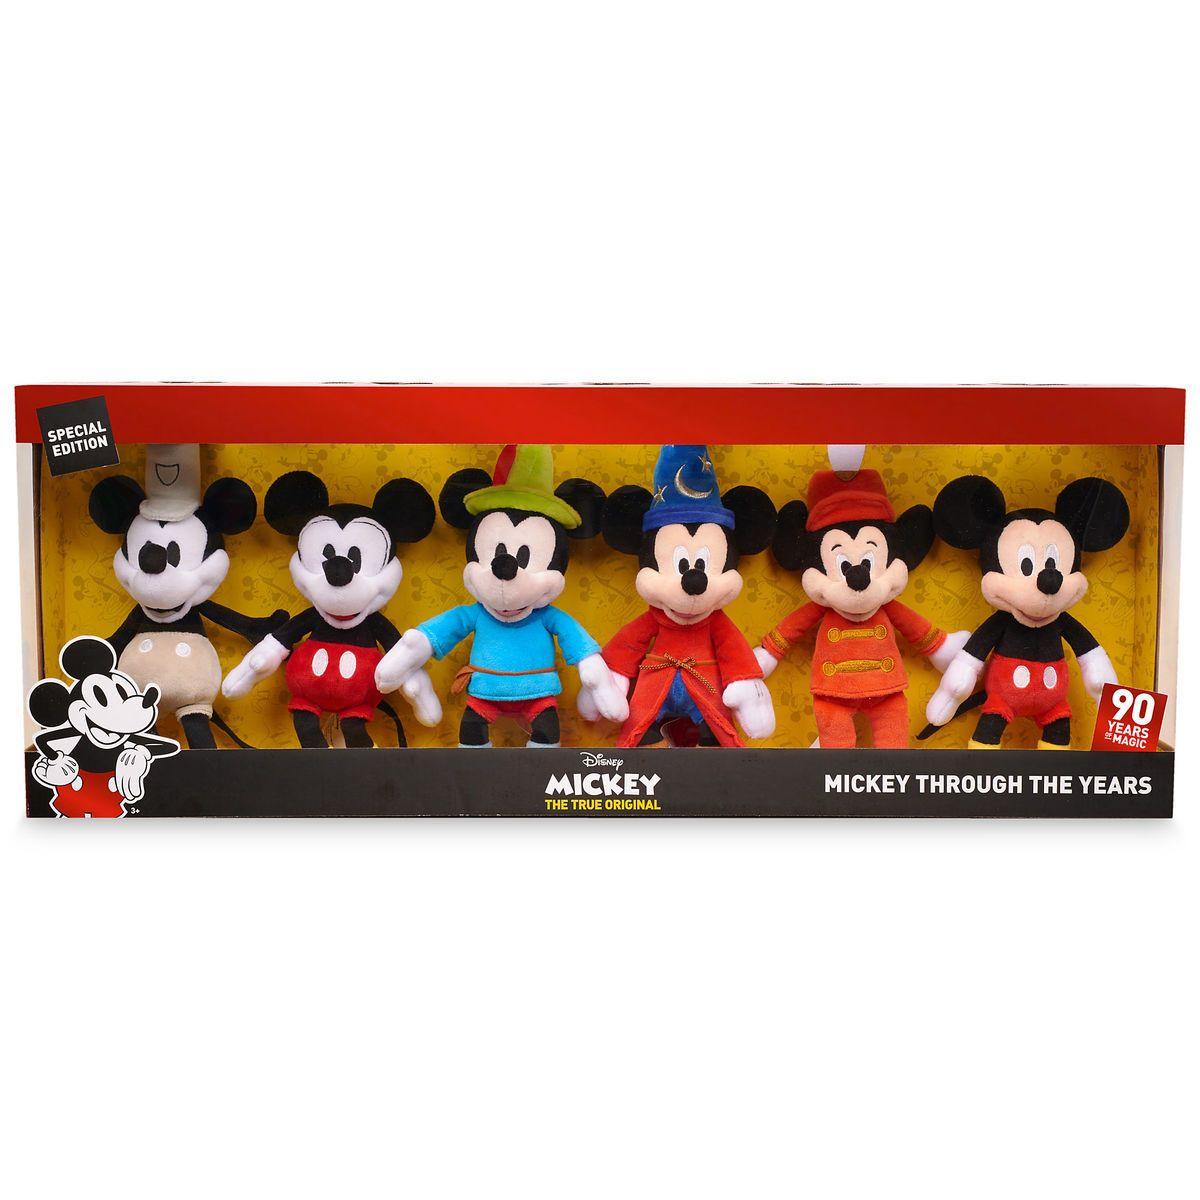 Tsum Tsum Mickey Steamboat Willie Set Supply Brand New In Box 90th Anniversary Choice Materials